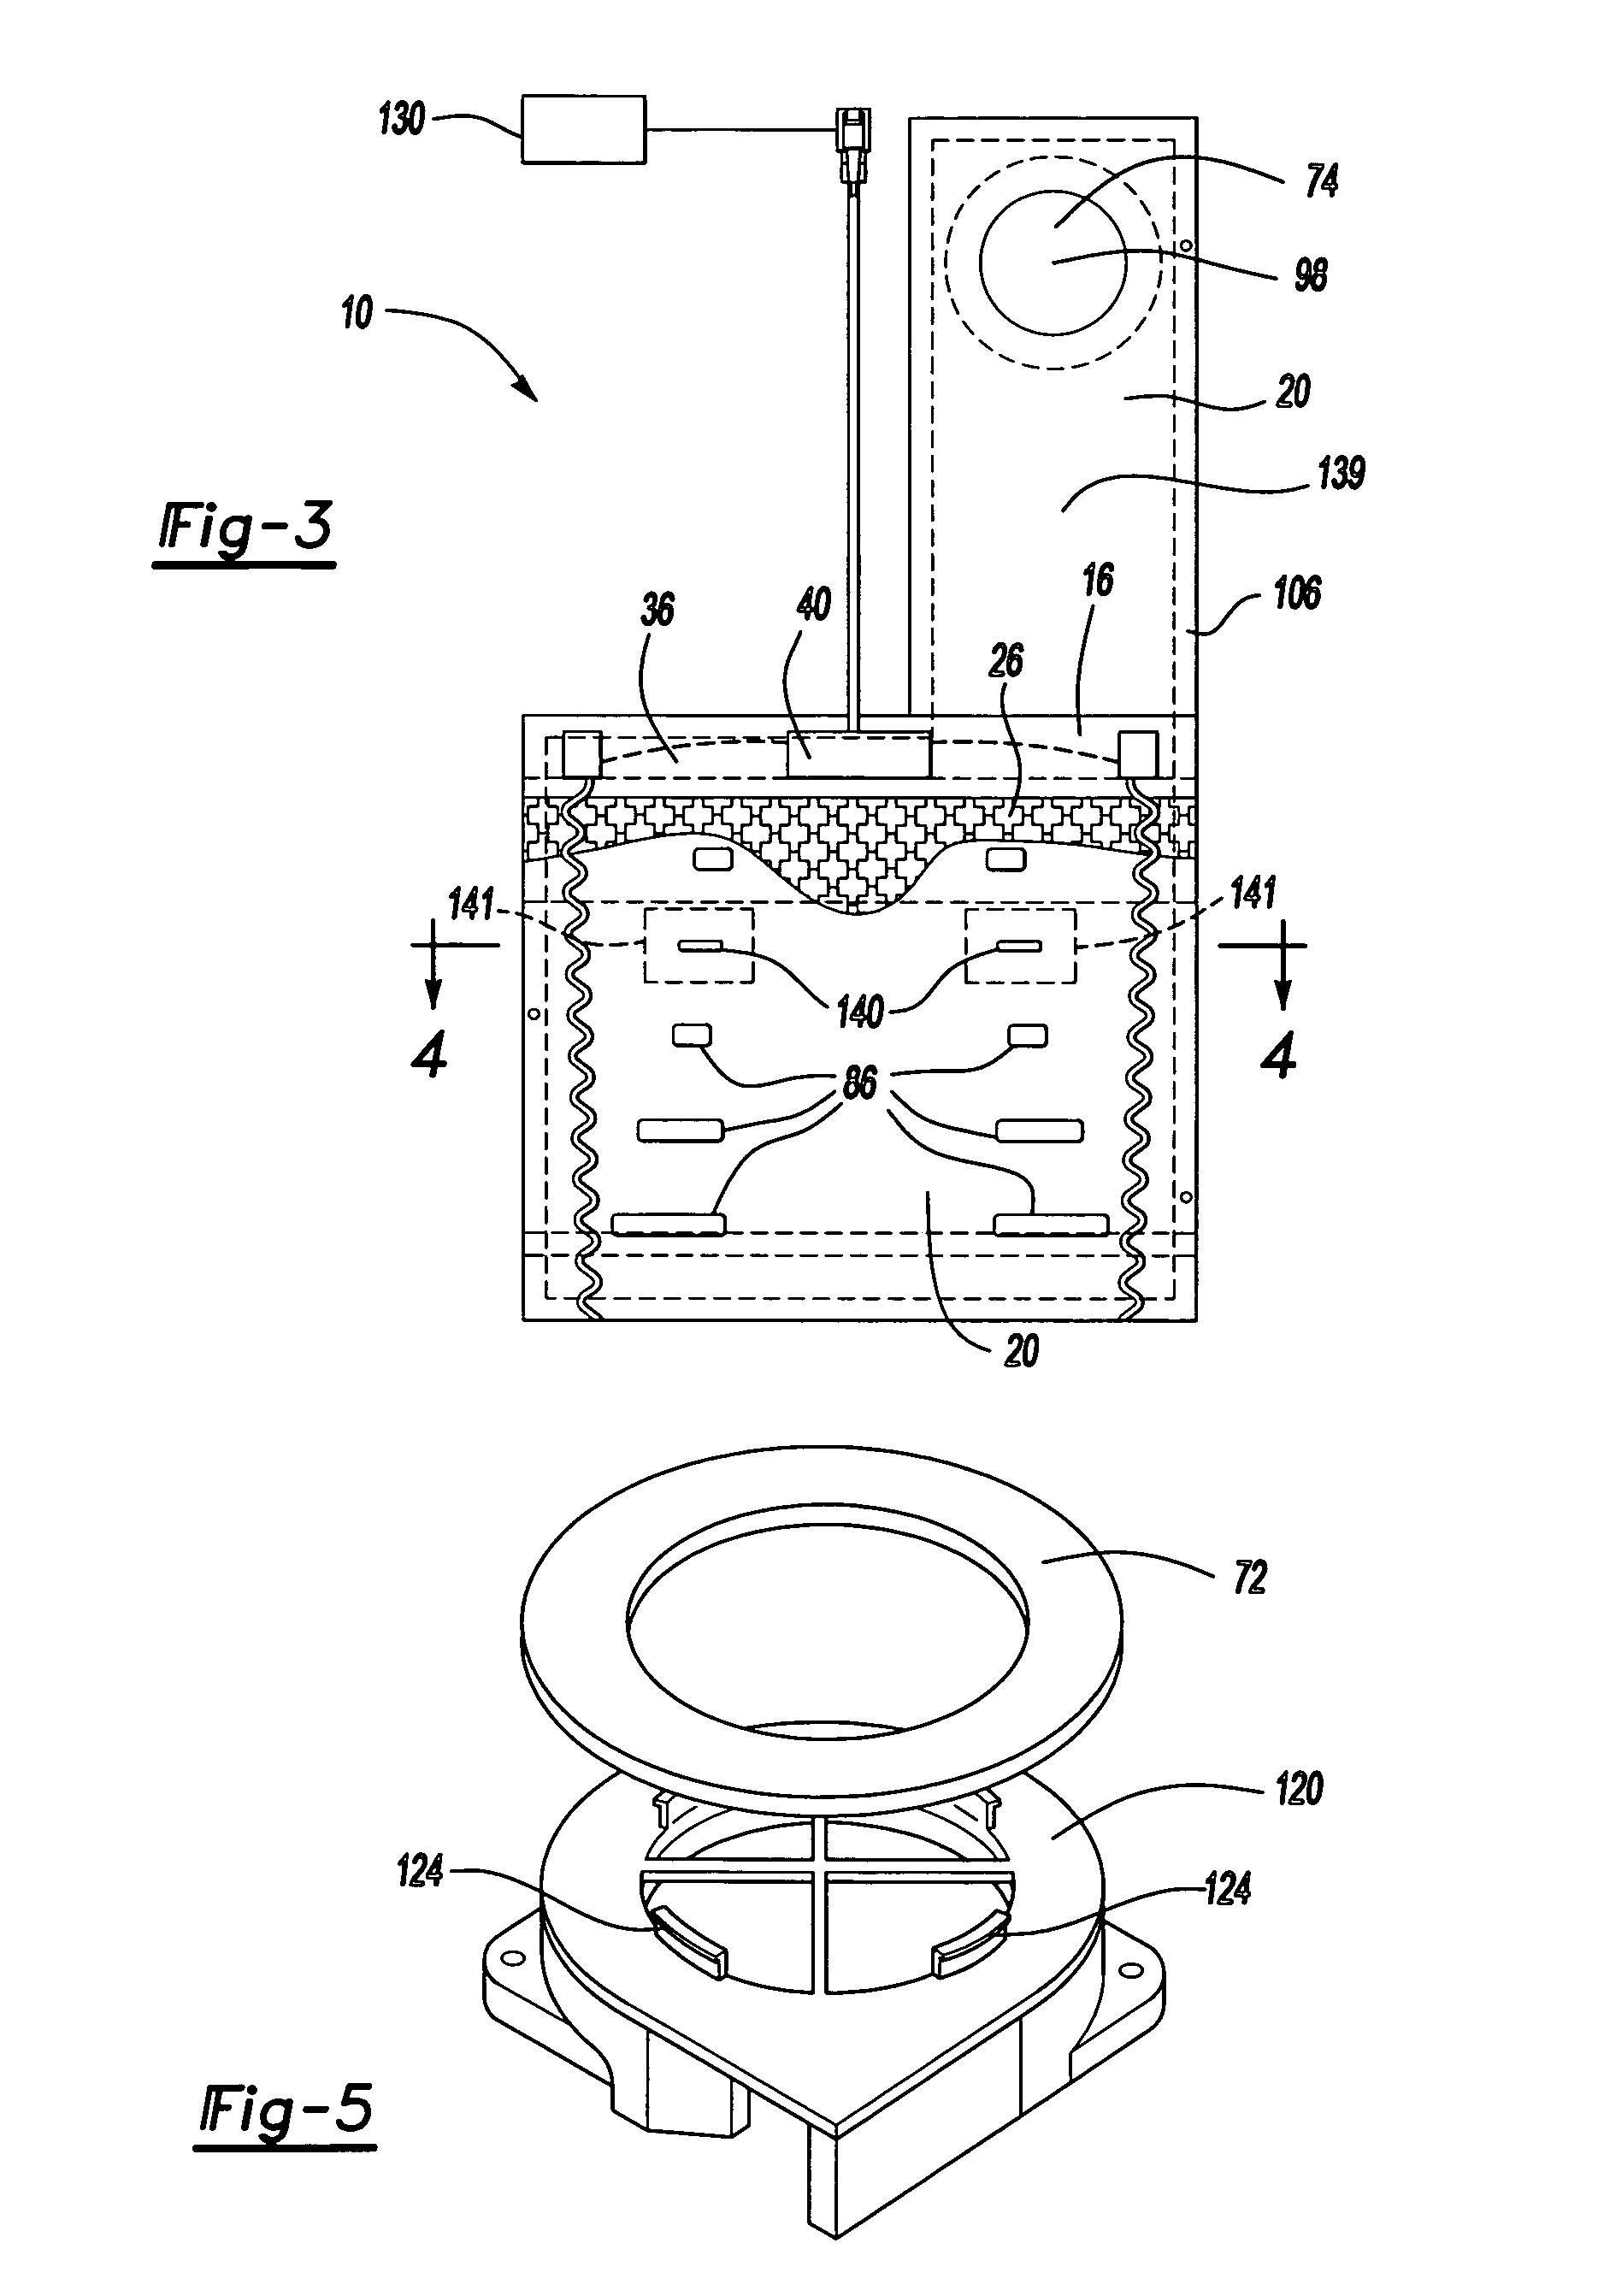 Circuit Electric For Guide Pontiac G6 Fuse Box Diagram